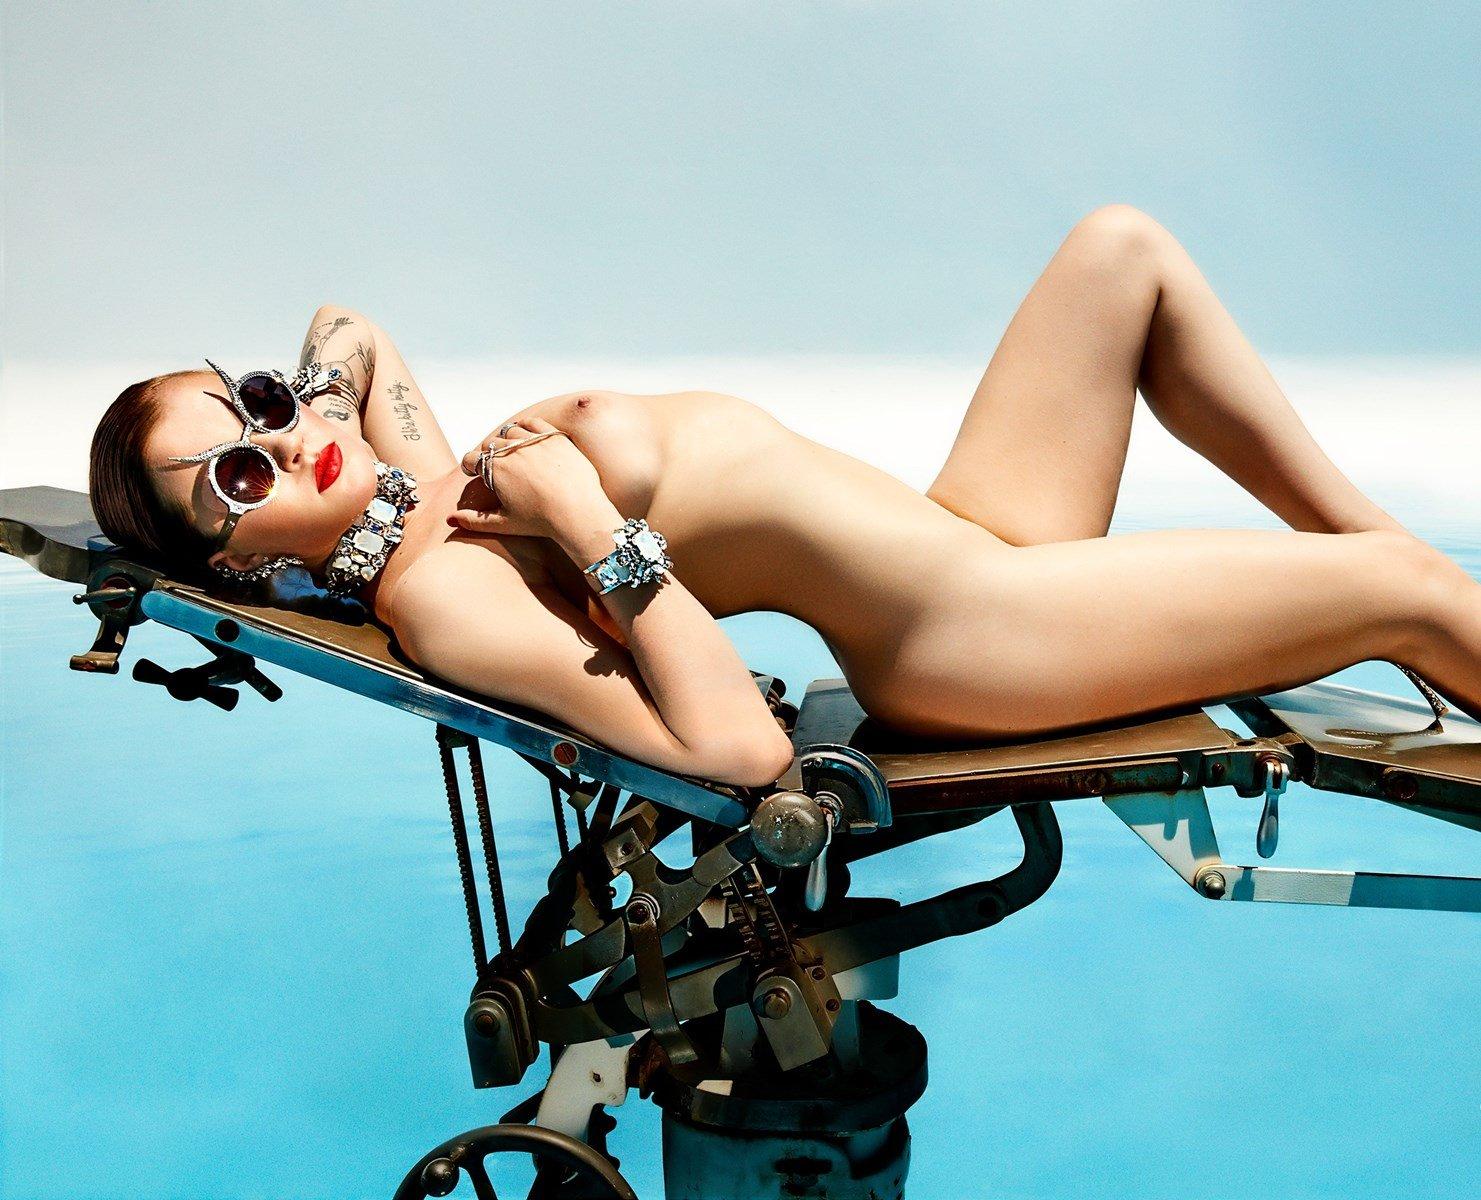 Ireland Baldwin Nude Photo Shoot Outtakes